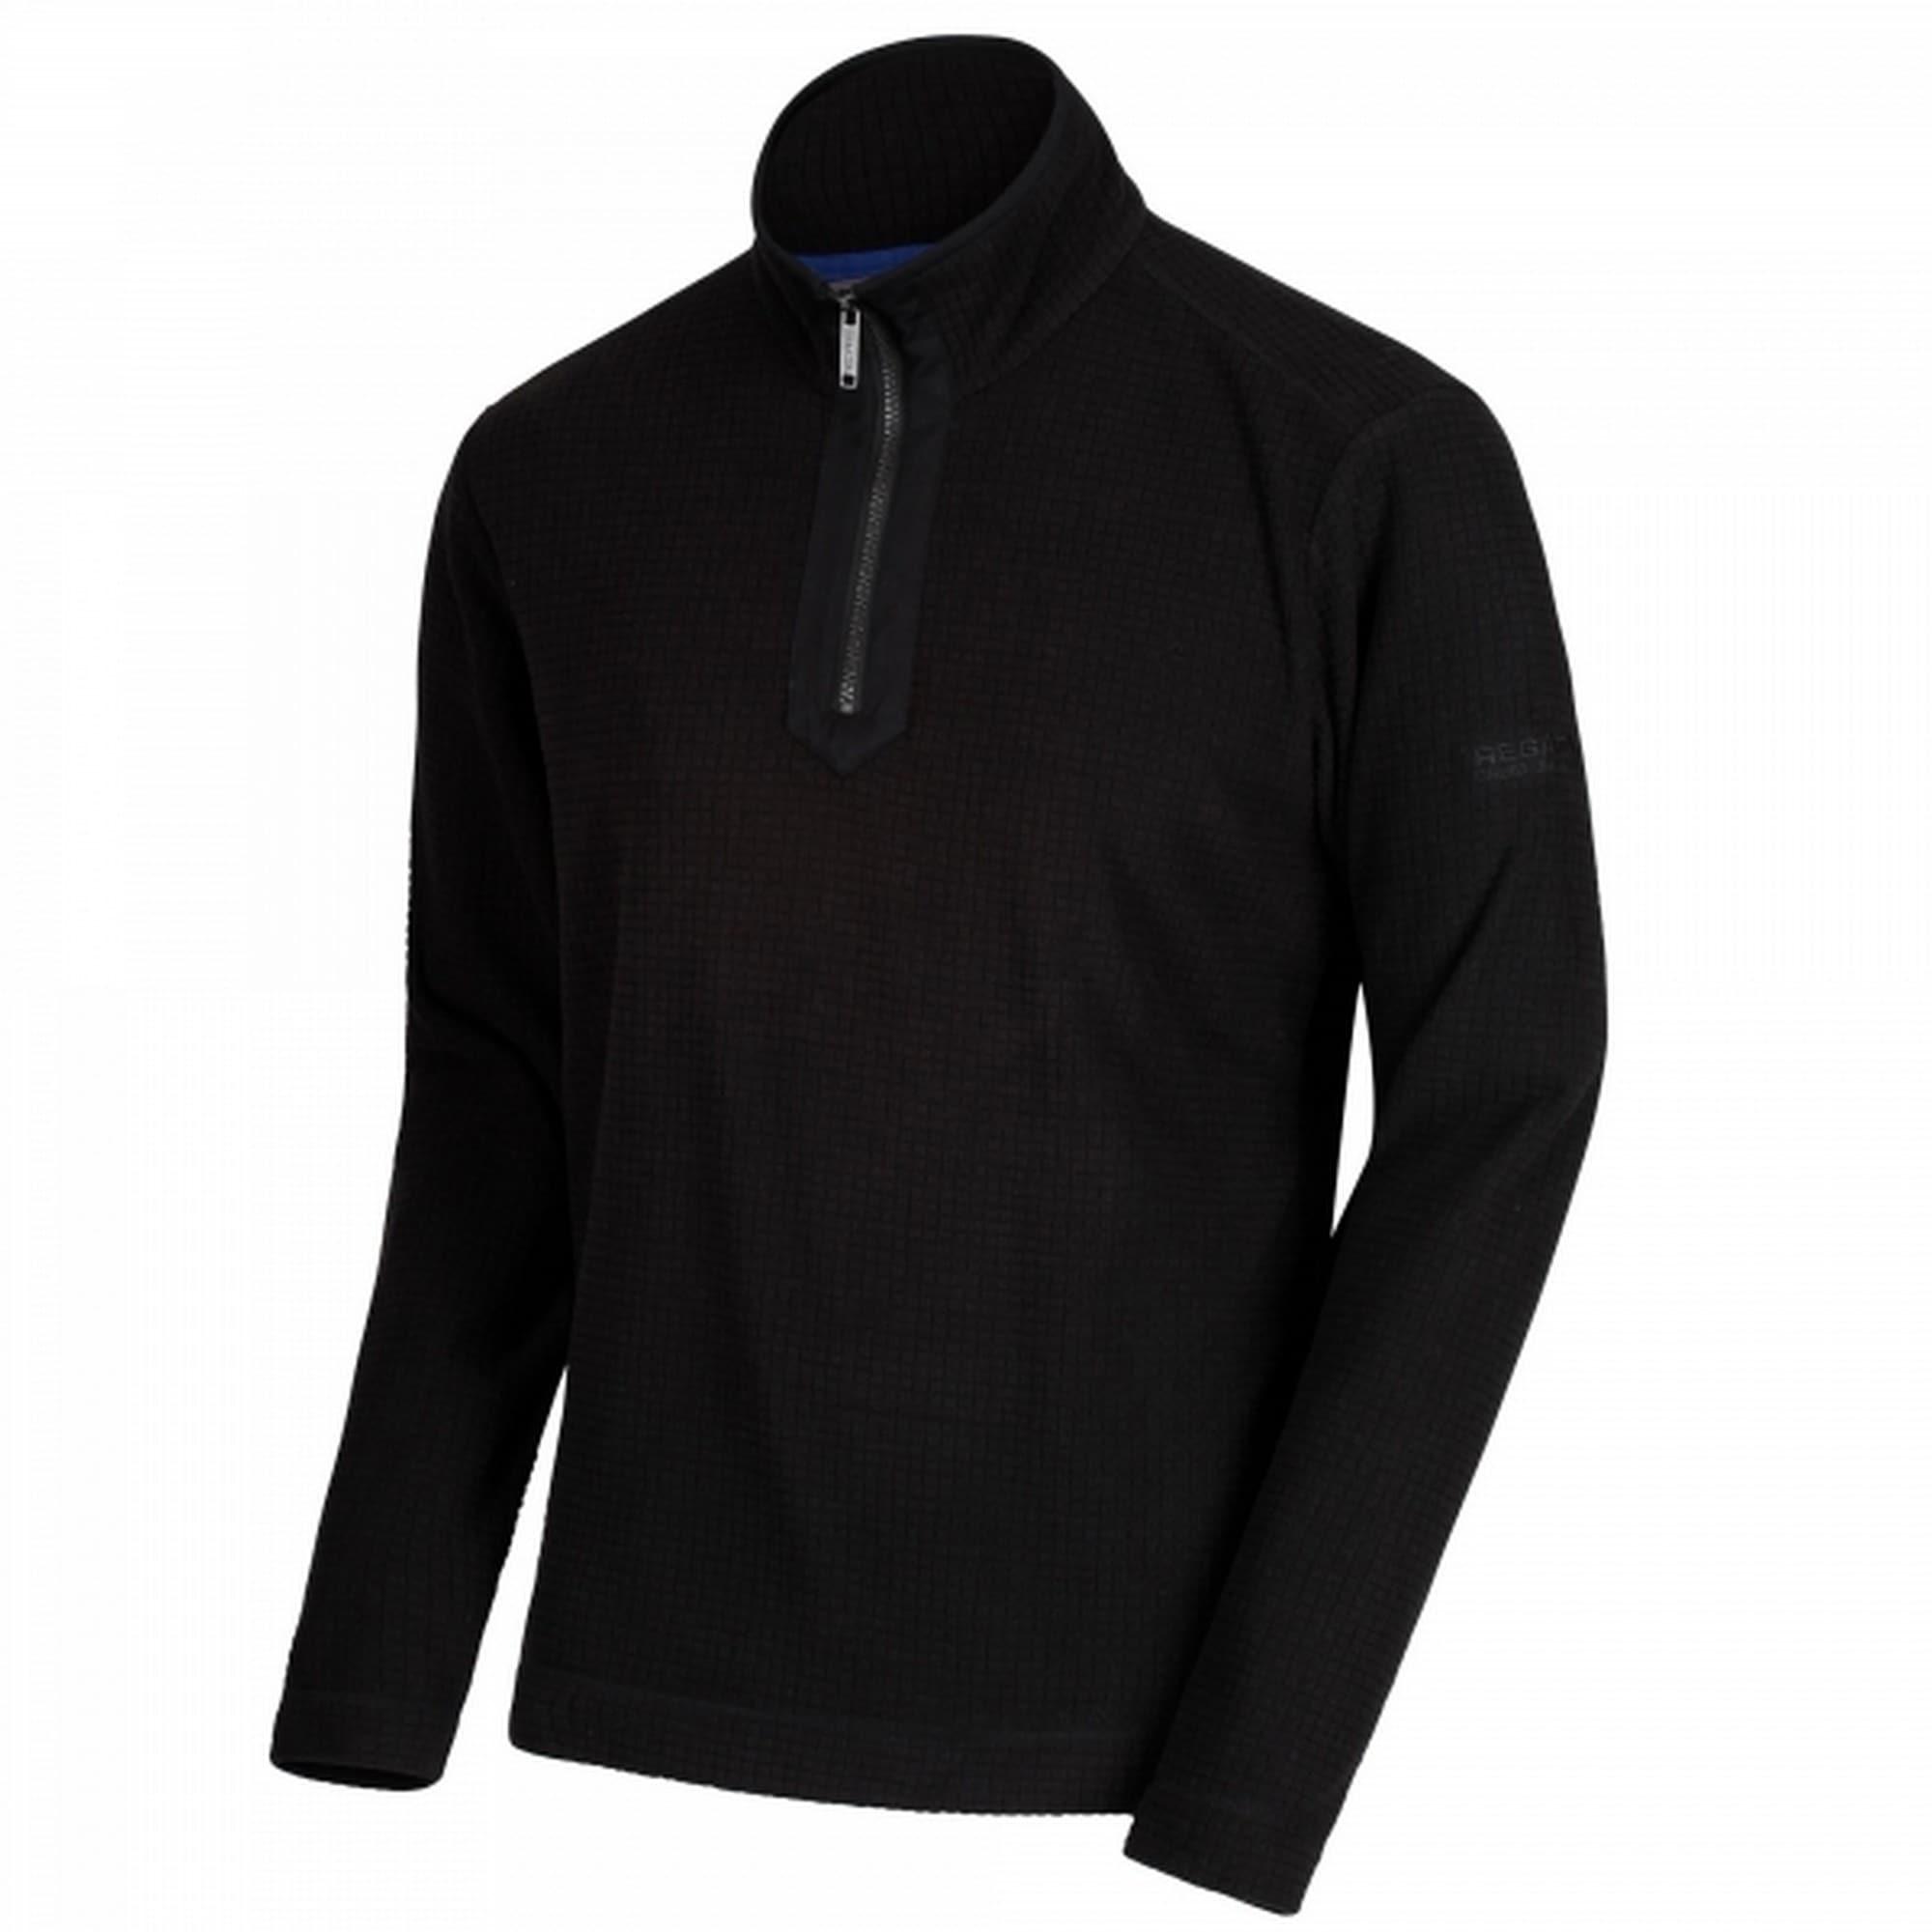 Regatta Fleecejacke | Bekleidung > Jacken > Fleecejacken | Schwarz | Polyester | Regatta